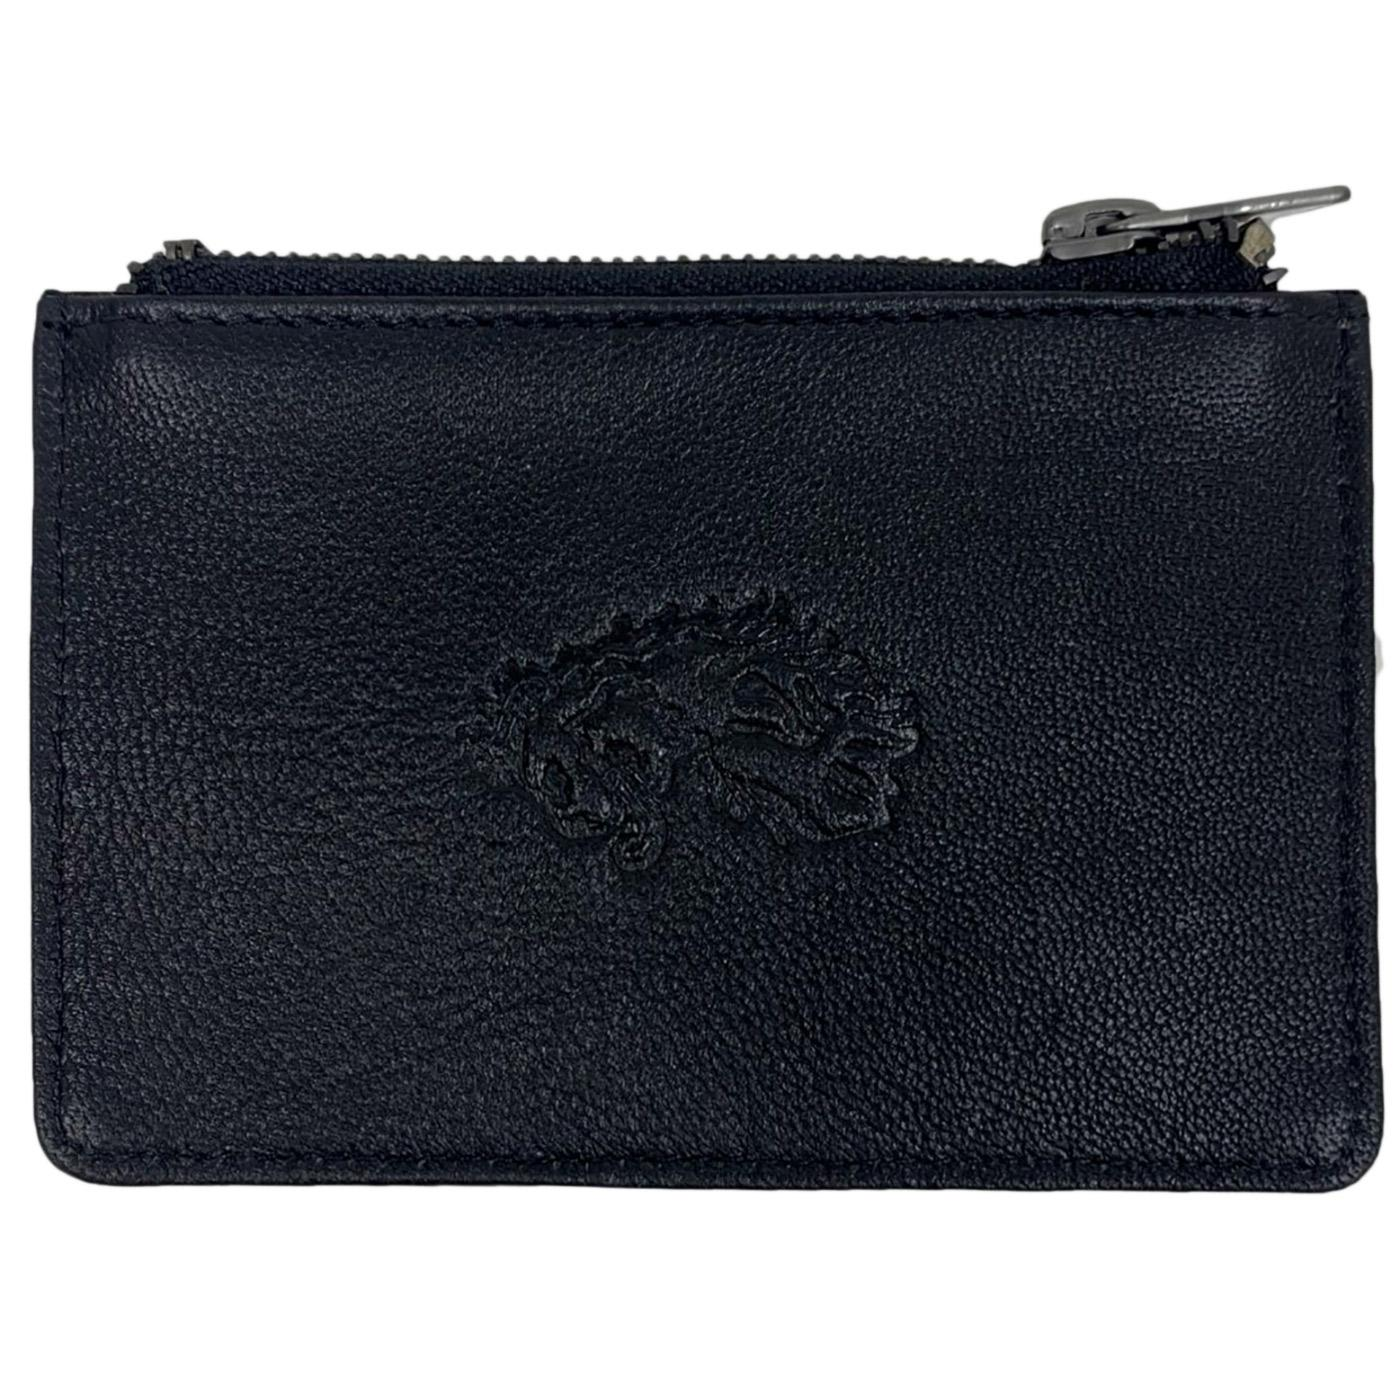 Kai LUKE Card Holder with Zip Pocket (Black)